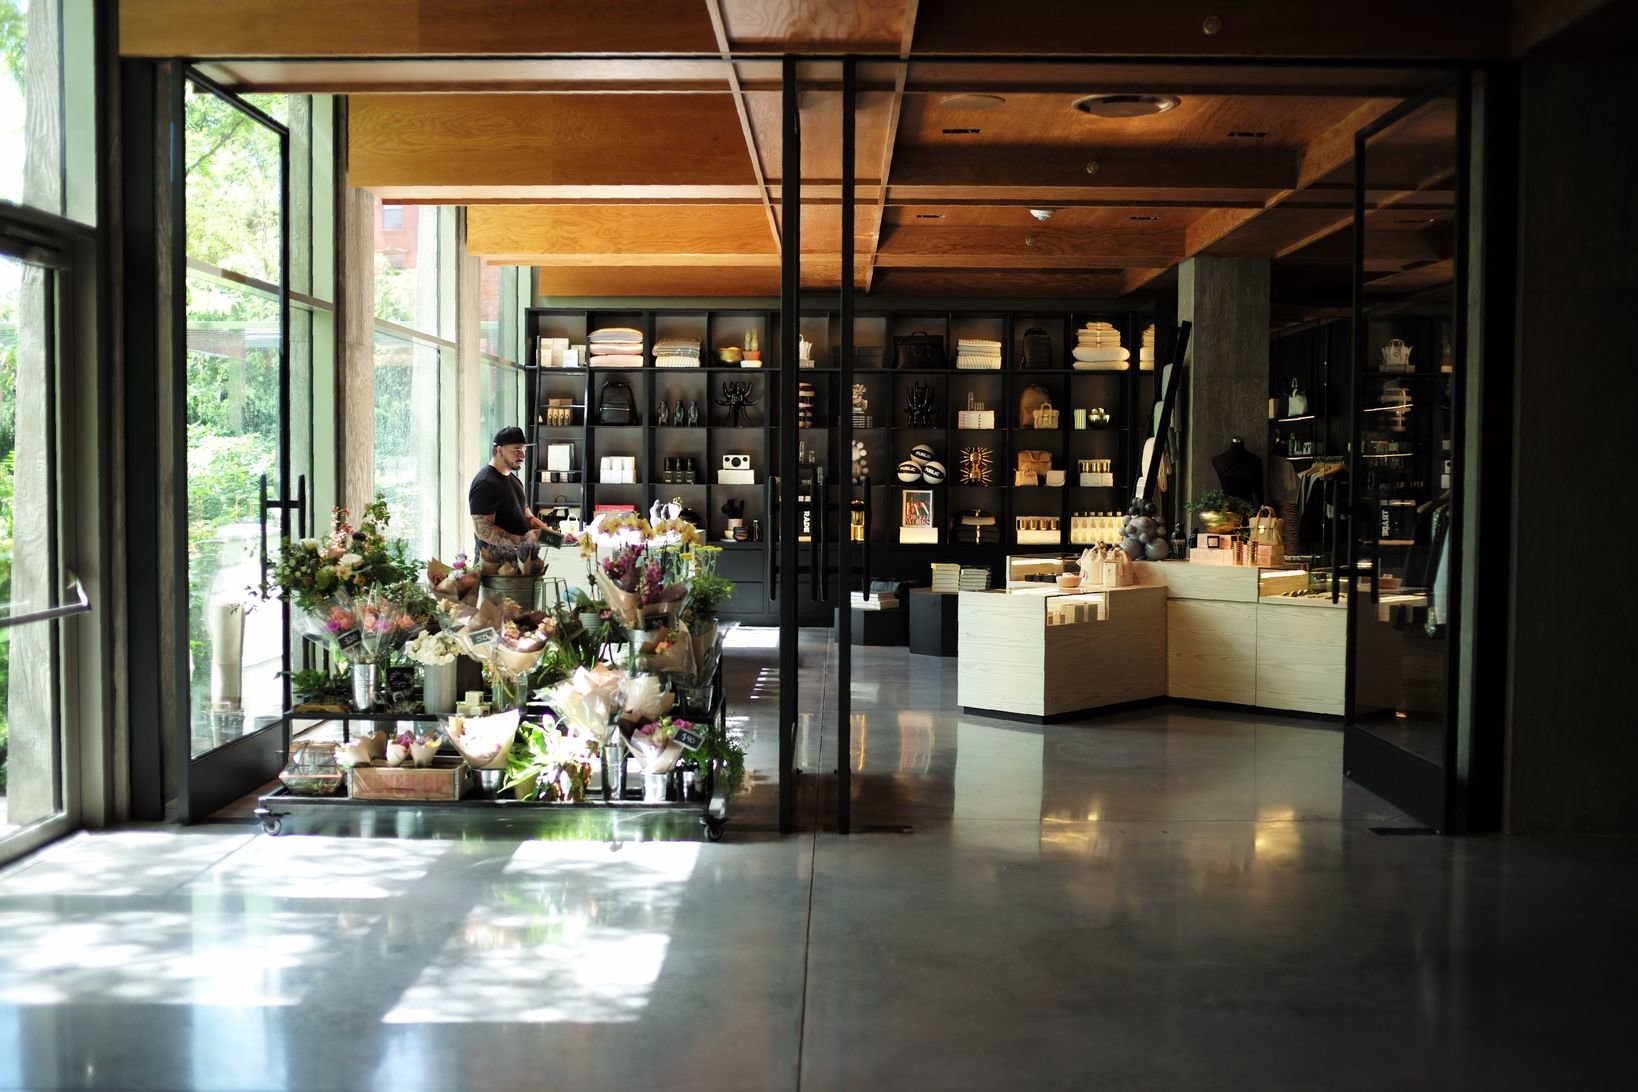 PUBLIC Hotelの1Fには衣服や本、アクセサリーなどを取り扱うセンスのよいショップがある。